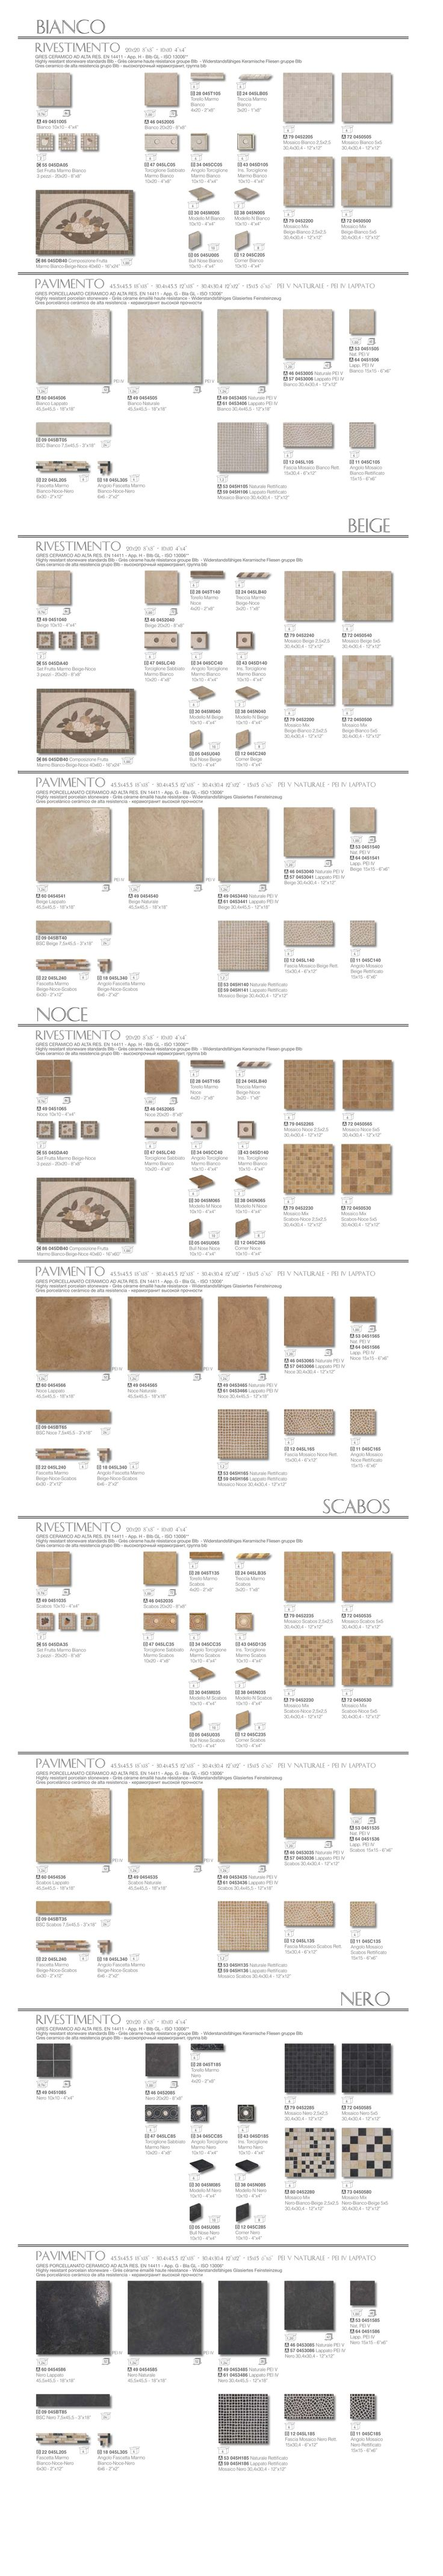 Elios Ceramica - PIETRE DEL SOLE - Colori